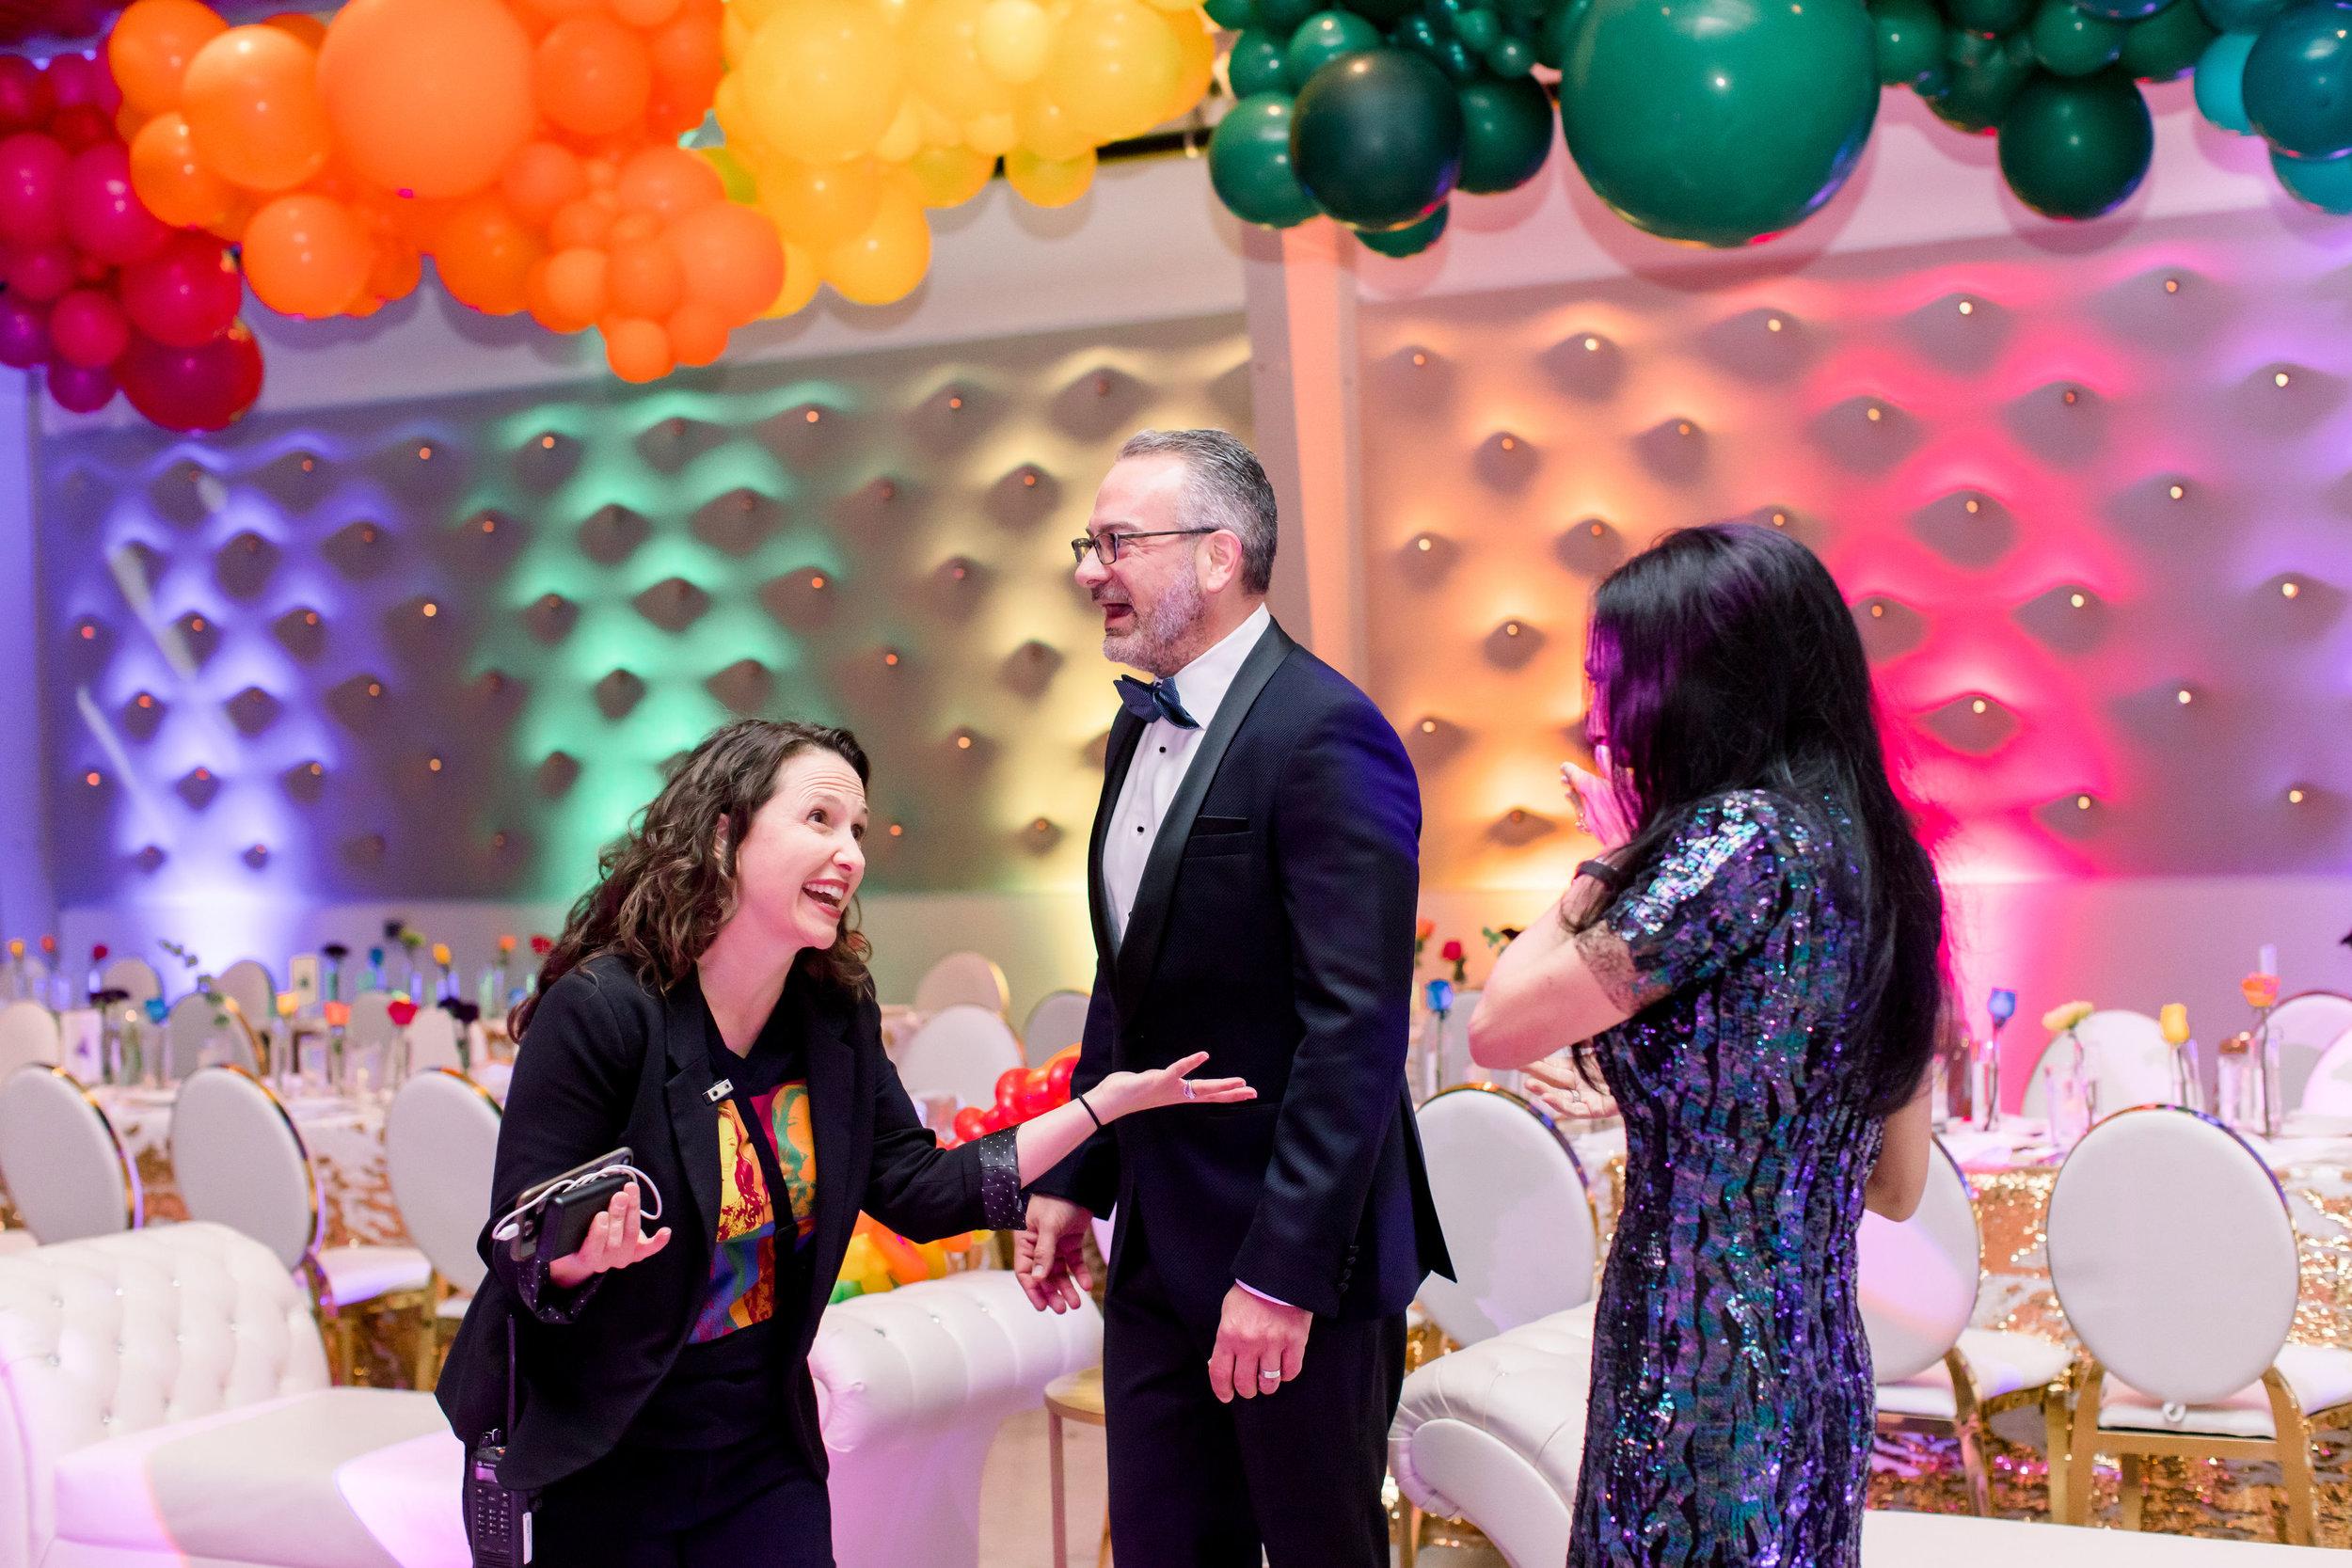 26 happy bat mitzvah parents party planner Life Design Events photos by Stephanie Heymann Photography.jpg